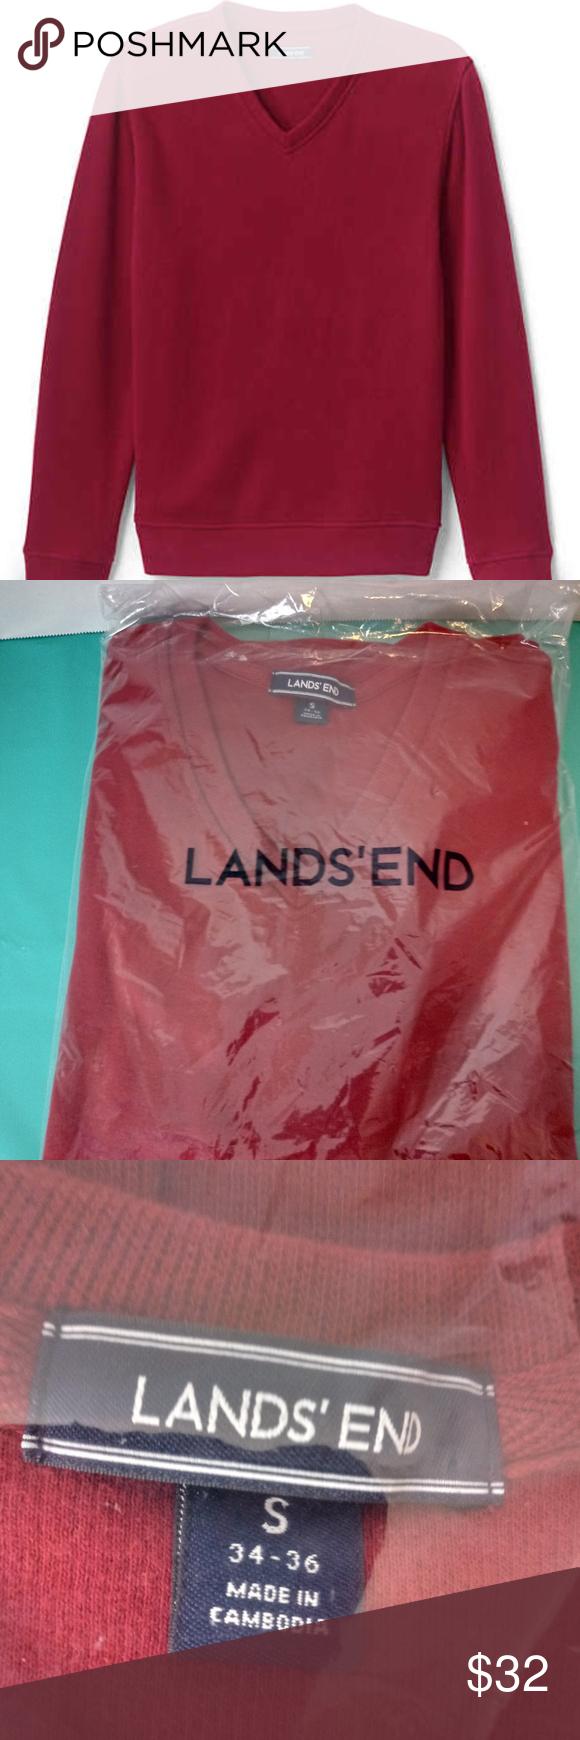 Lands End Men S Bedford Rib V Neck Sweater Nwt Vneck Sweater Sweaters Men S V Neck Sweaters [ 1740 x 580 Pixel ]